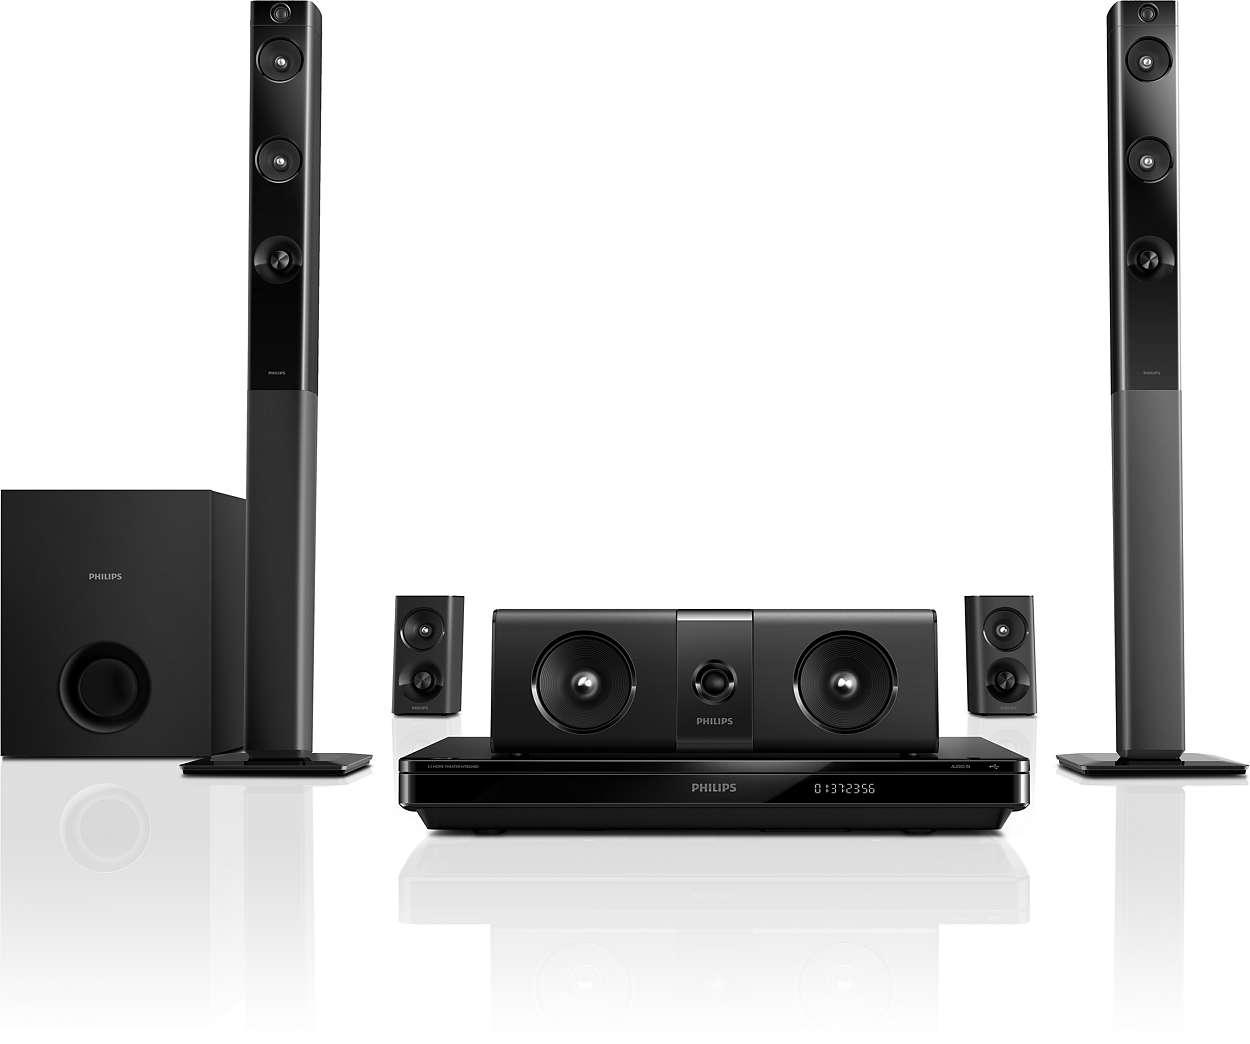 Crystal Clear Sound 給您身歷其境的影音體驗